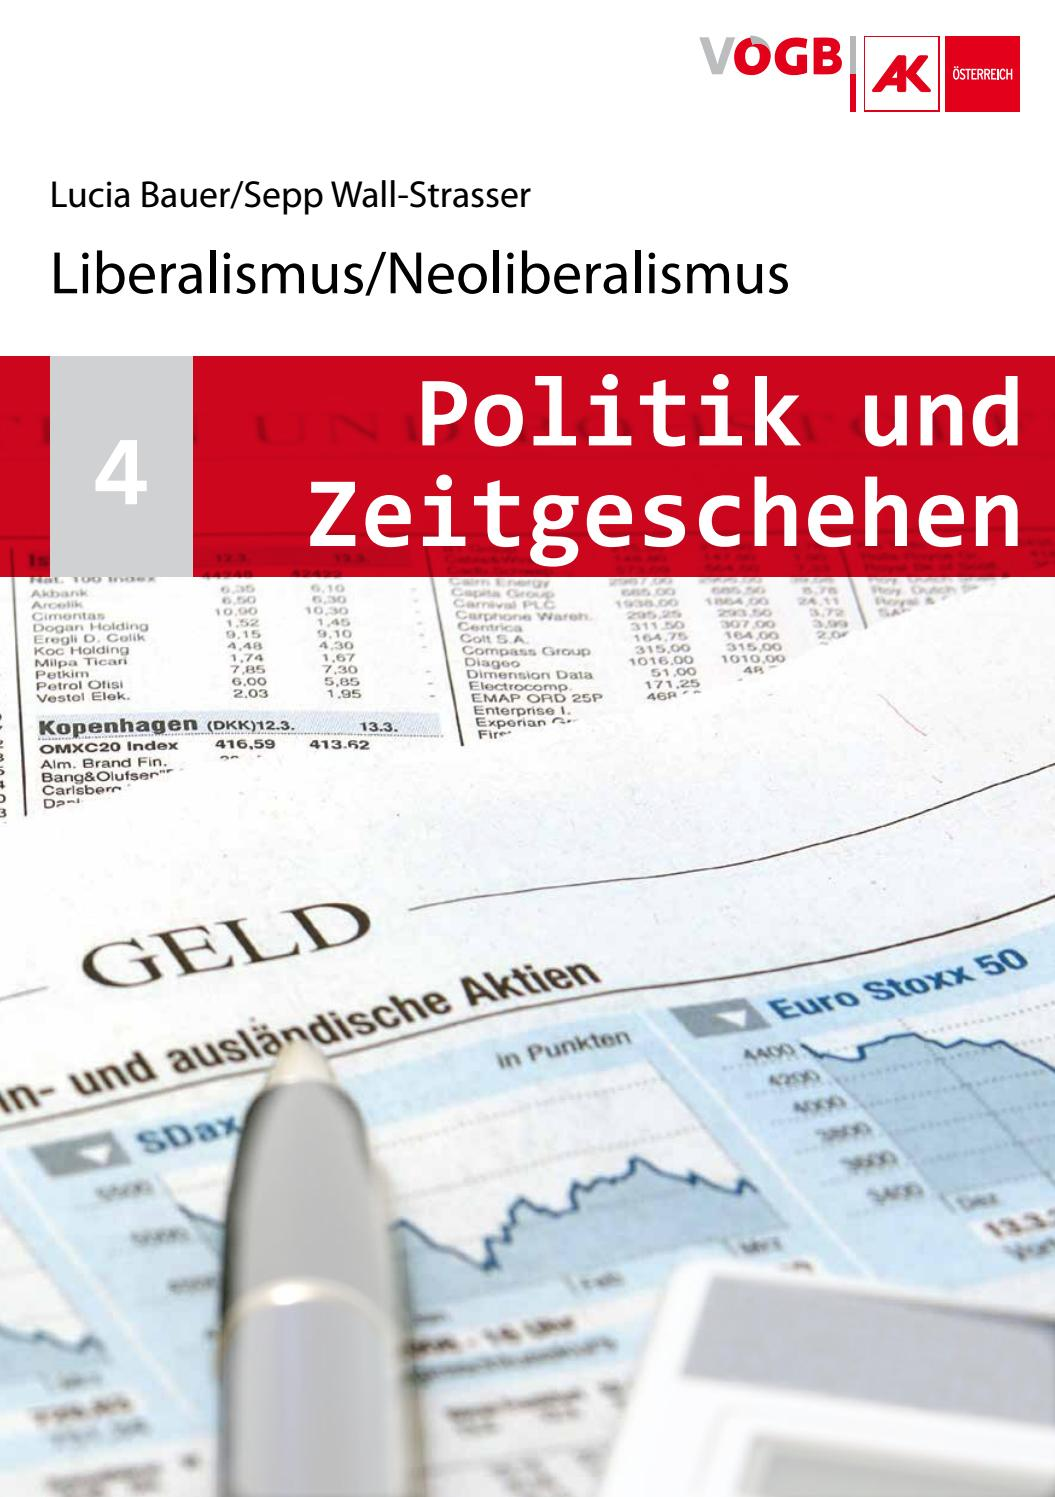 PZG-04_Liberalismus_Neoliberalismus by VÖGB Wien - issuu